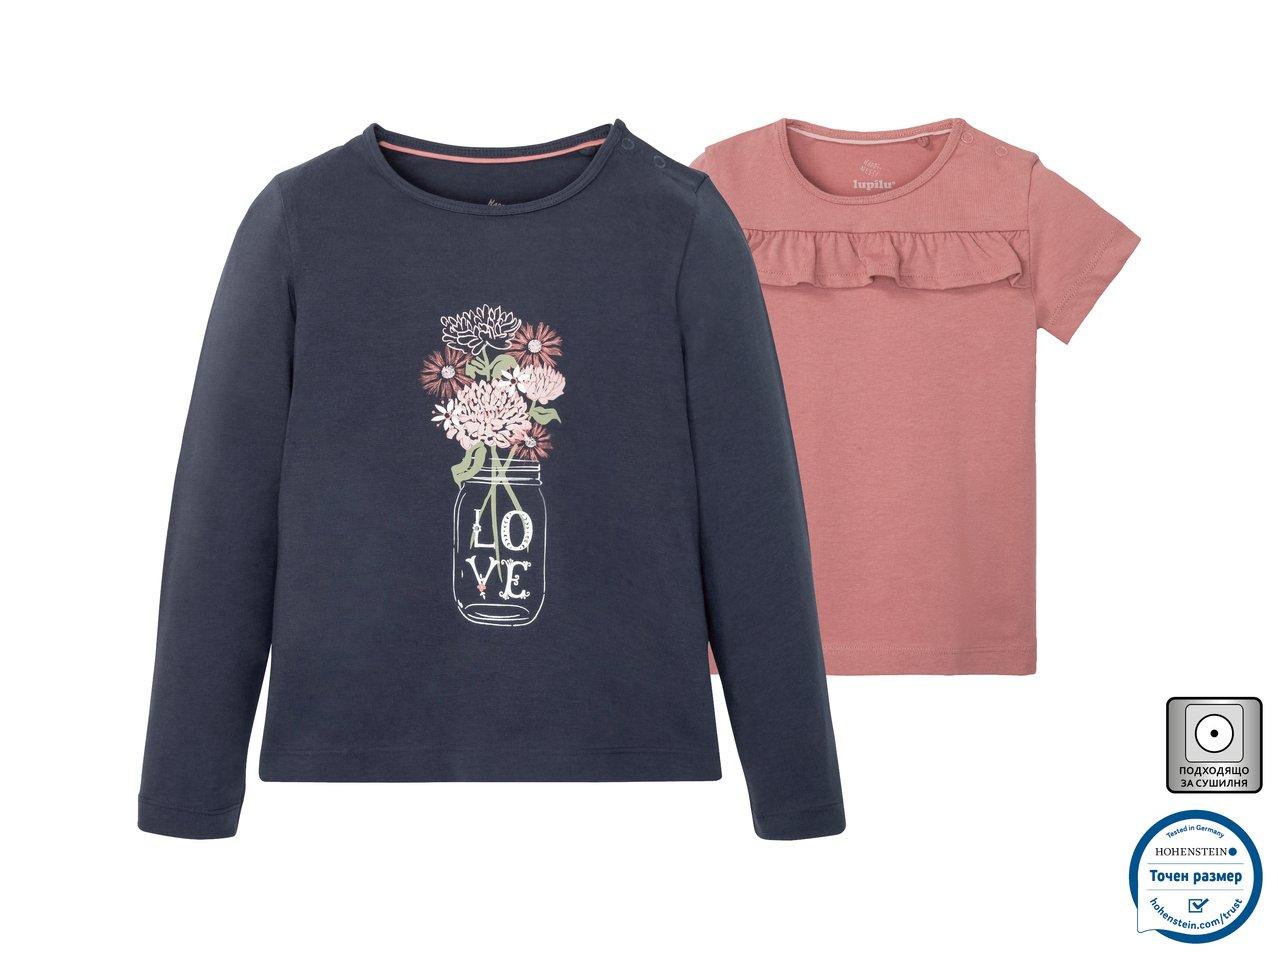 Детски блузи за момичета